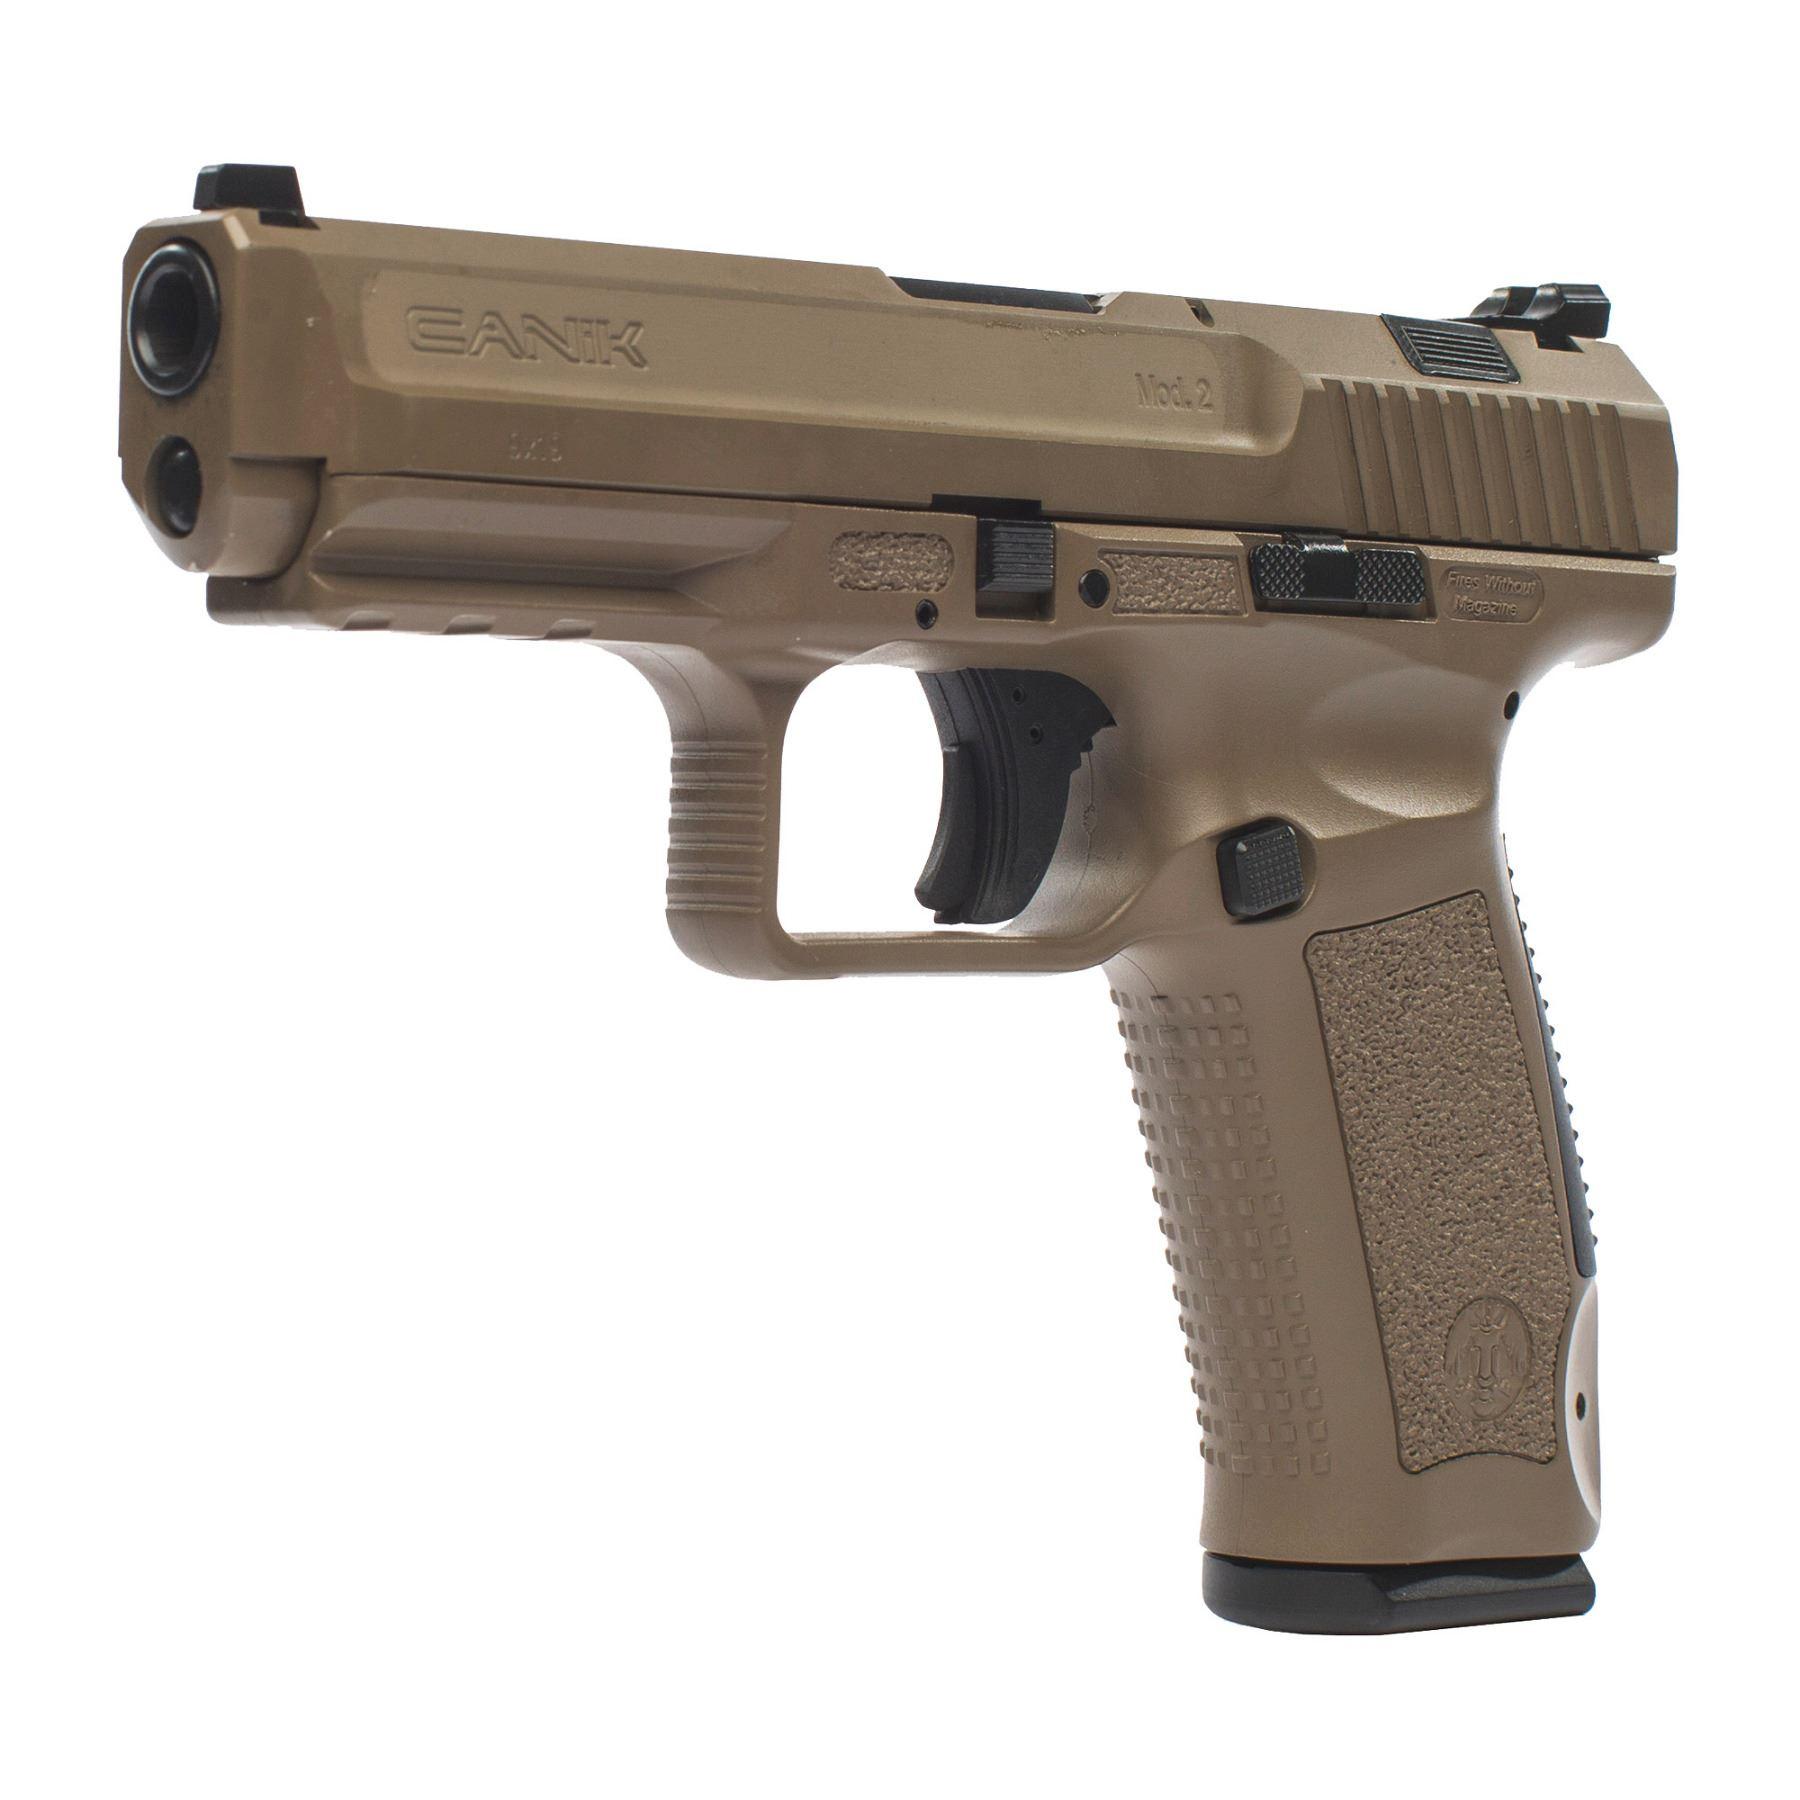 18 Shot, CANIK, TP9SA MOD 2, Striker Fired, 9MM, 4 47